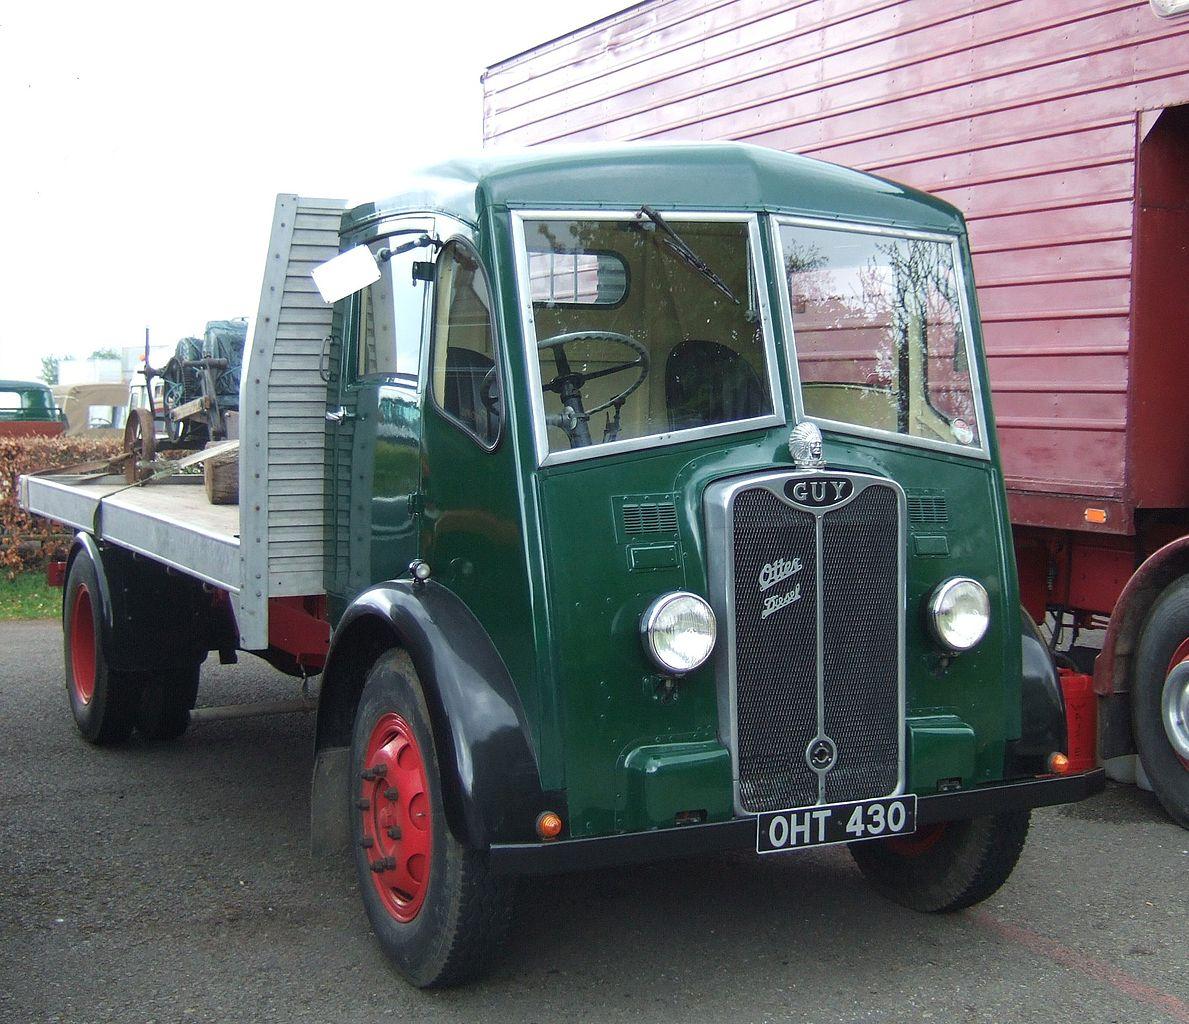 1189px-Guy_Otter_diesel_lorry,_Castle_Combe.jpg